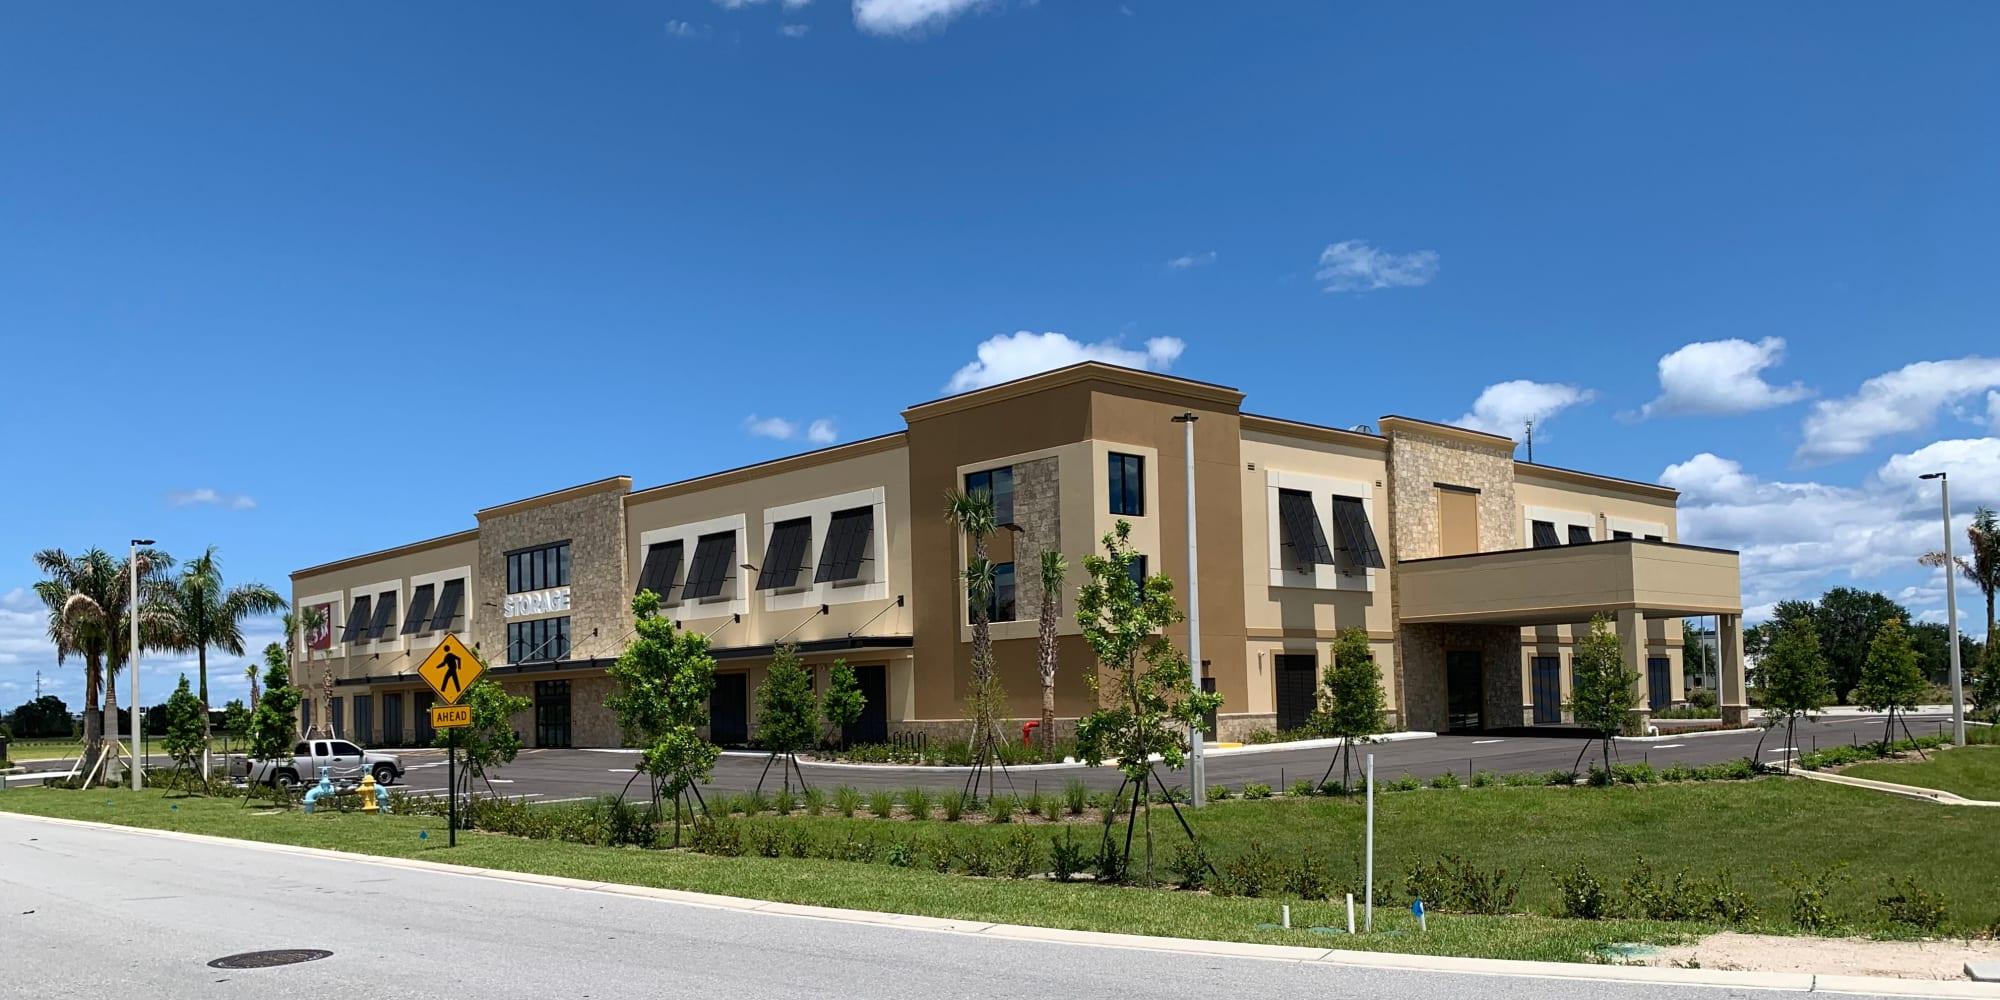 Exterior building of Spacebox Storage in Lake Park, Florida.